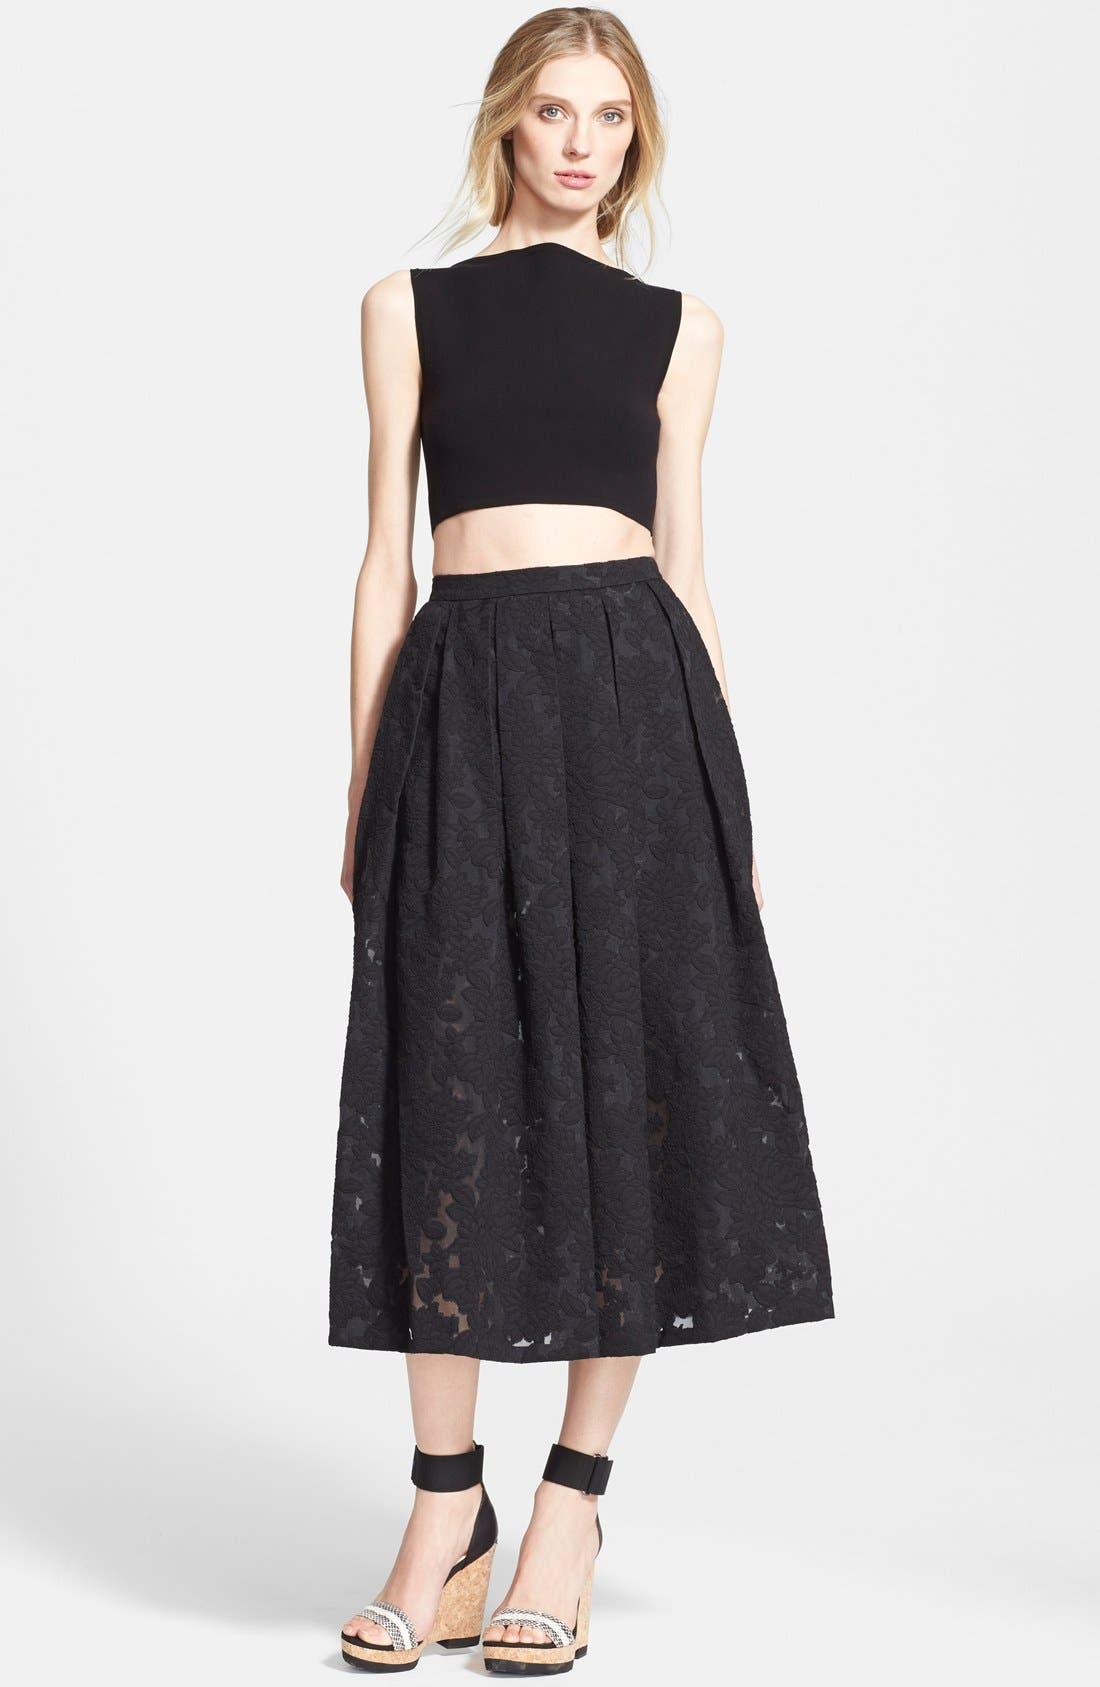 MICHAEL KORS, Floral Embroidered Pleated Midi Skirt, Alternate thumbnail 3, color, 001